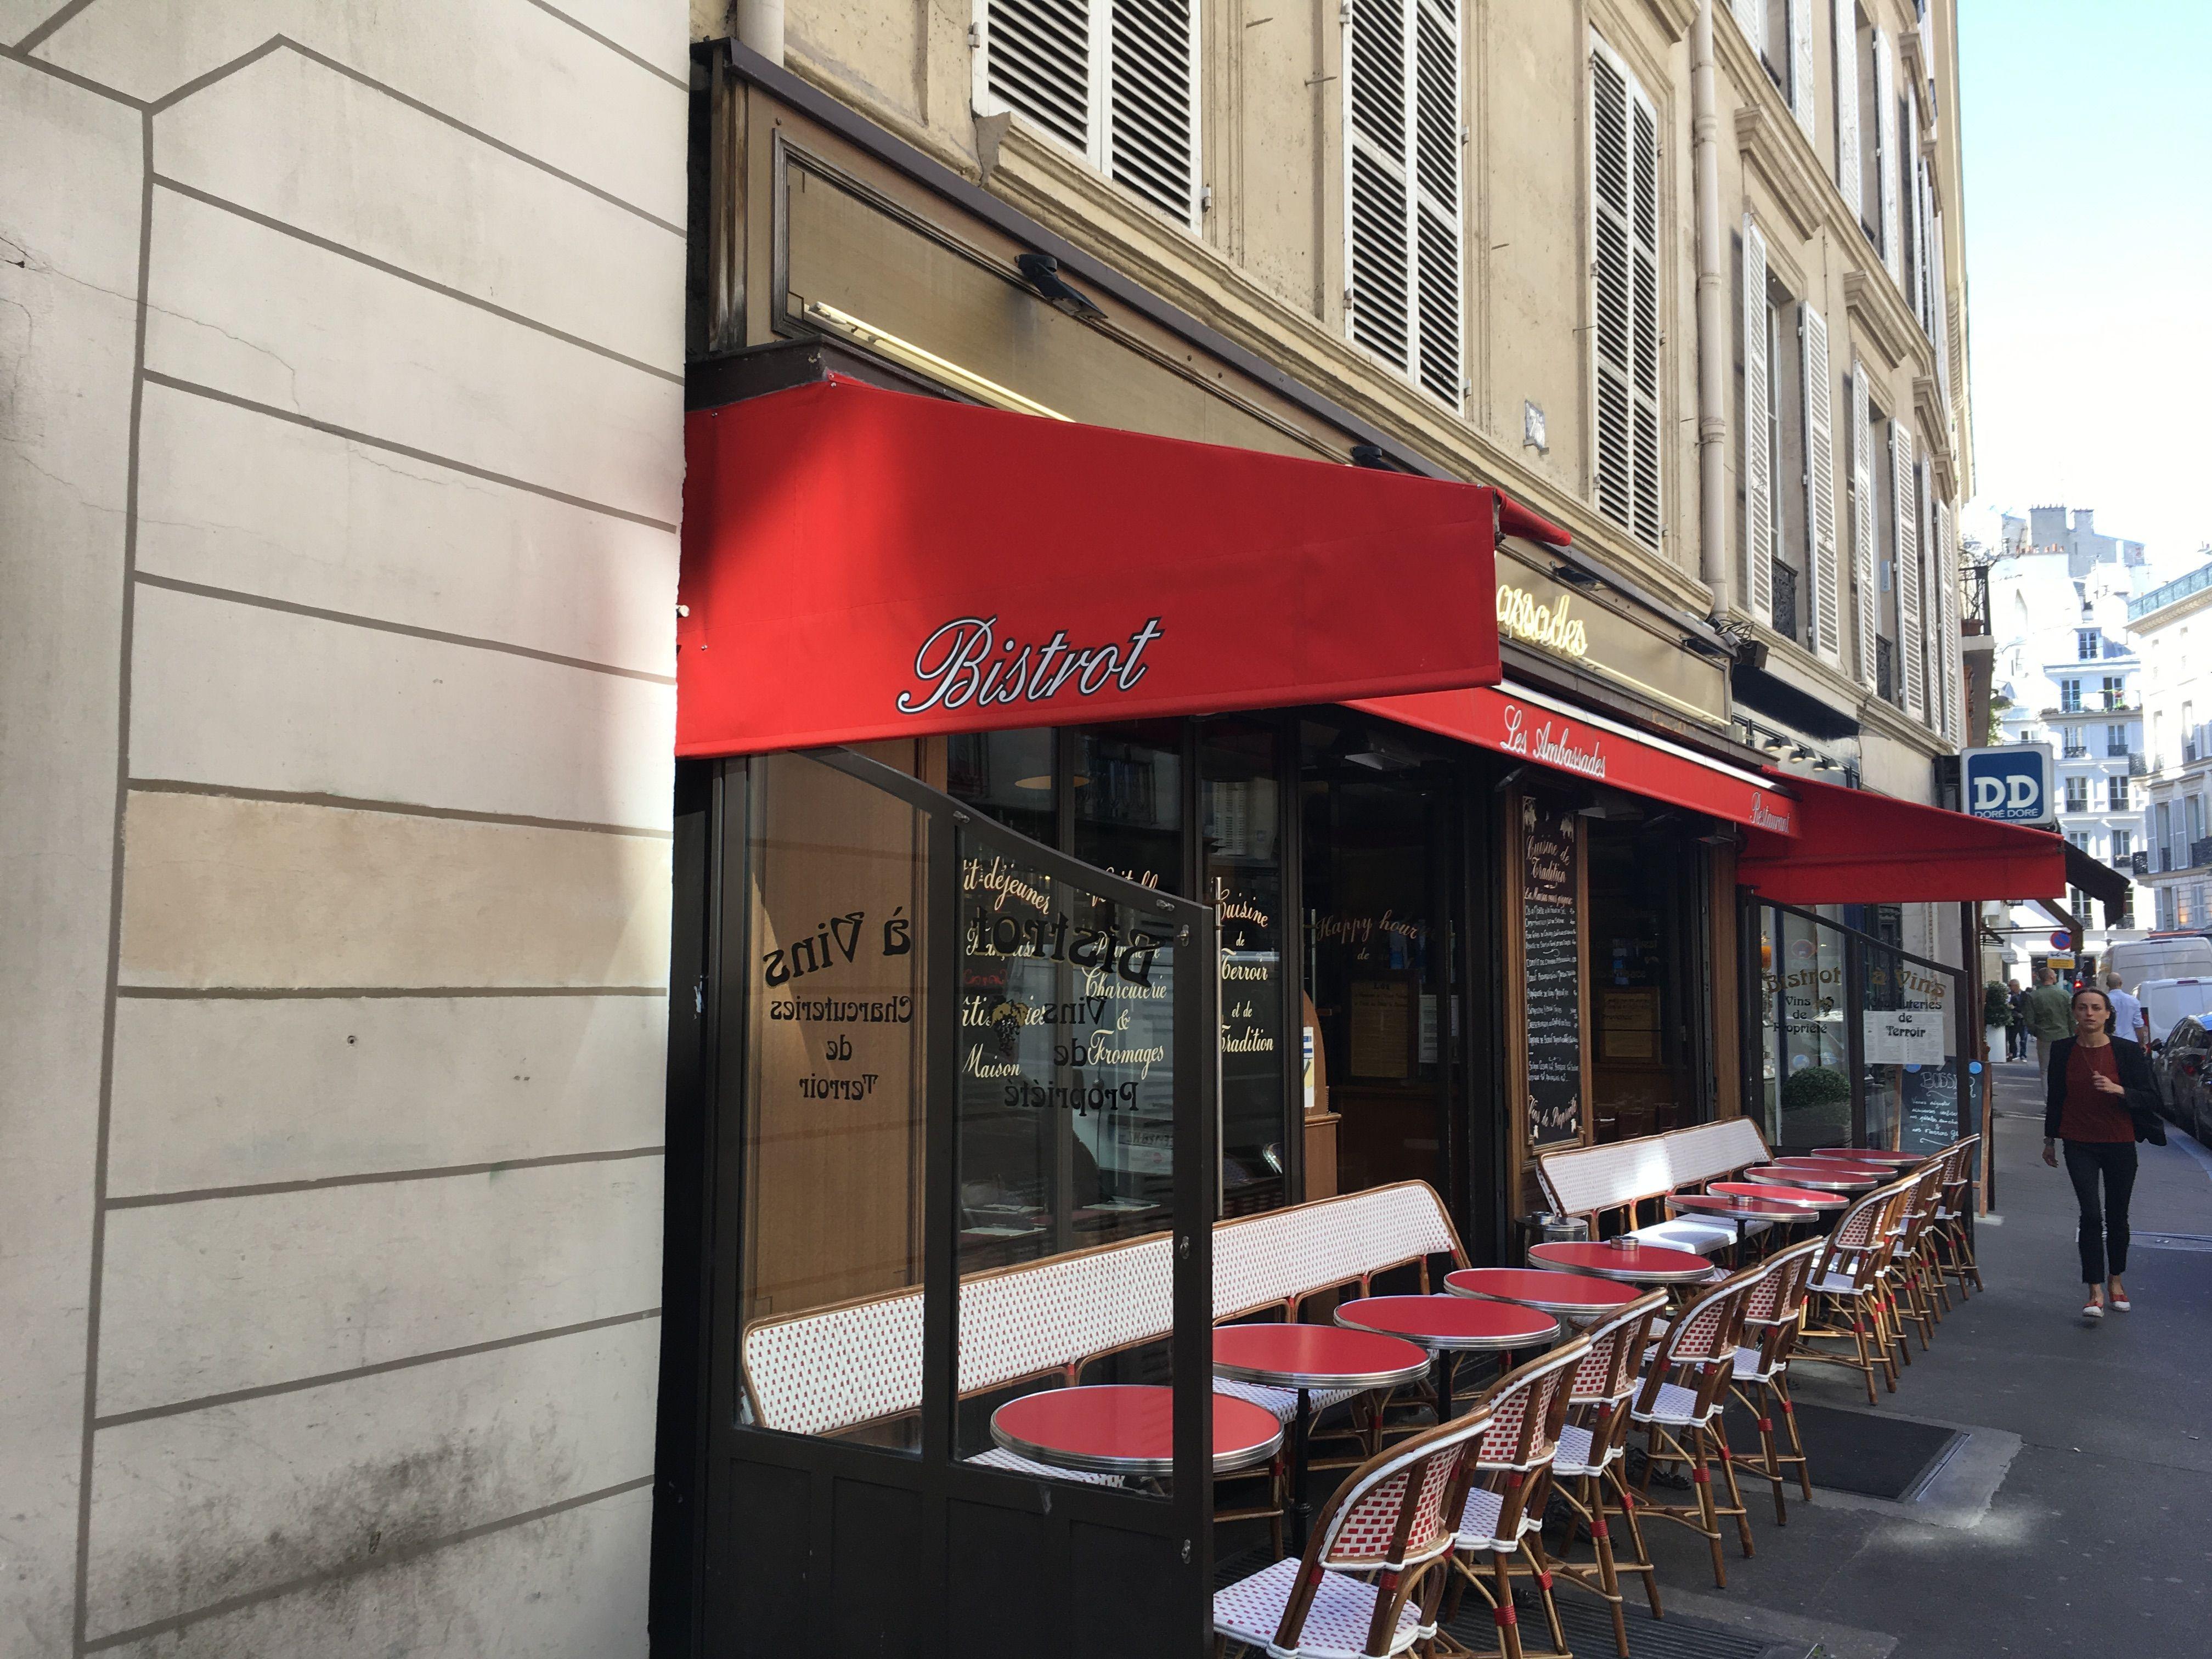 Cafe Les Ambassades 75 Rue Du Bac Paris 07 Rue Du Bac Paris Cafe De Paris Rue Du Bac